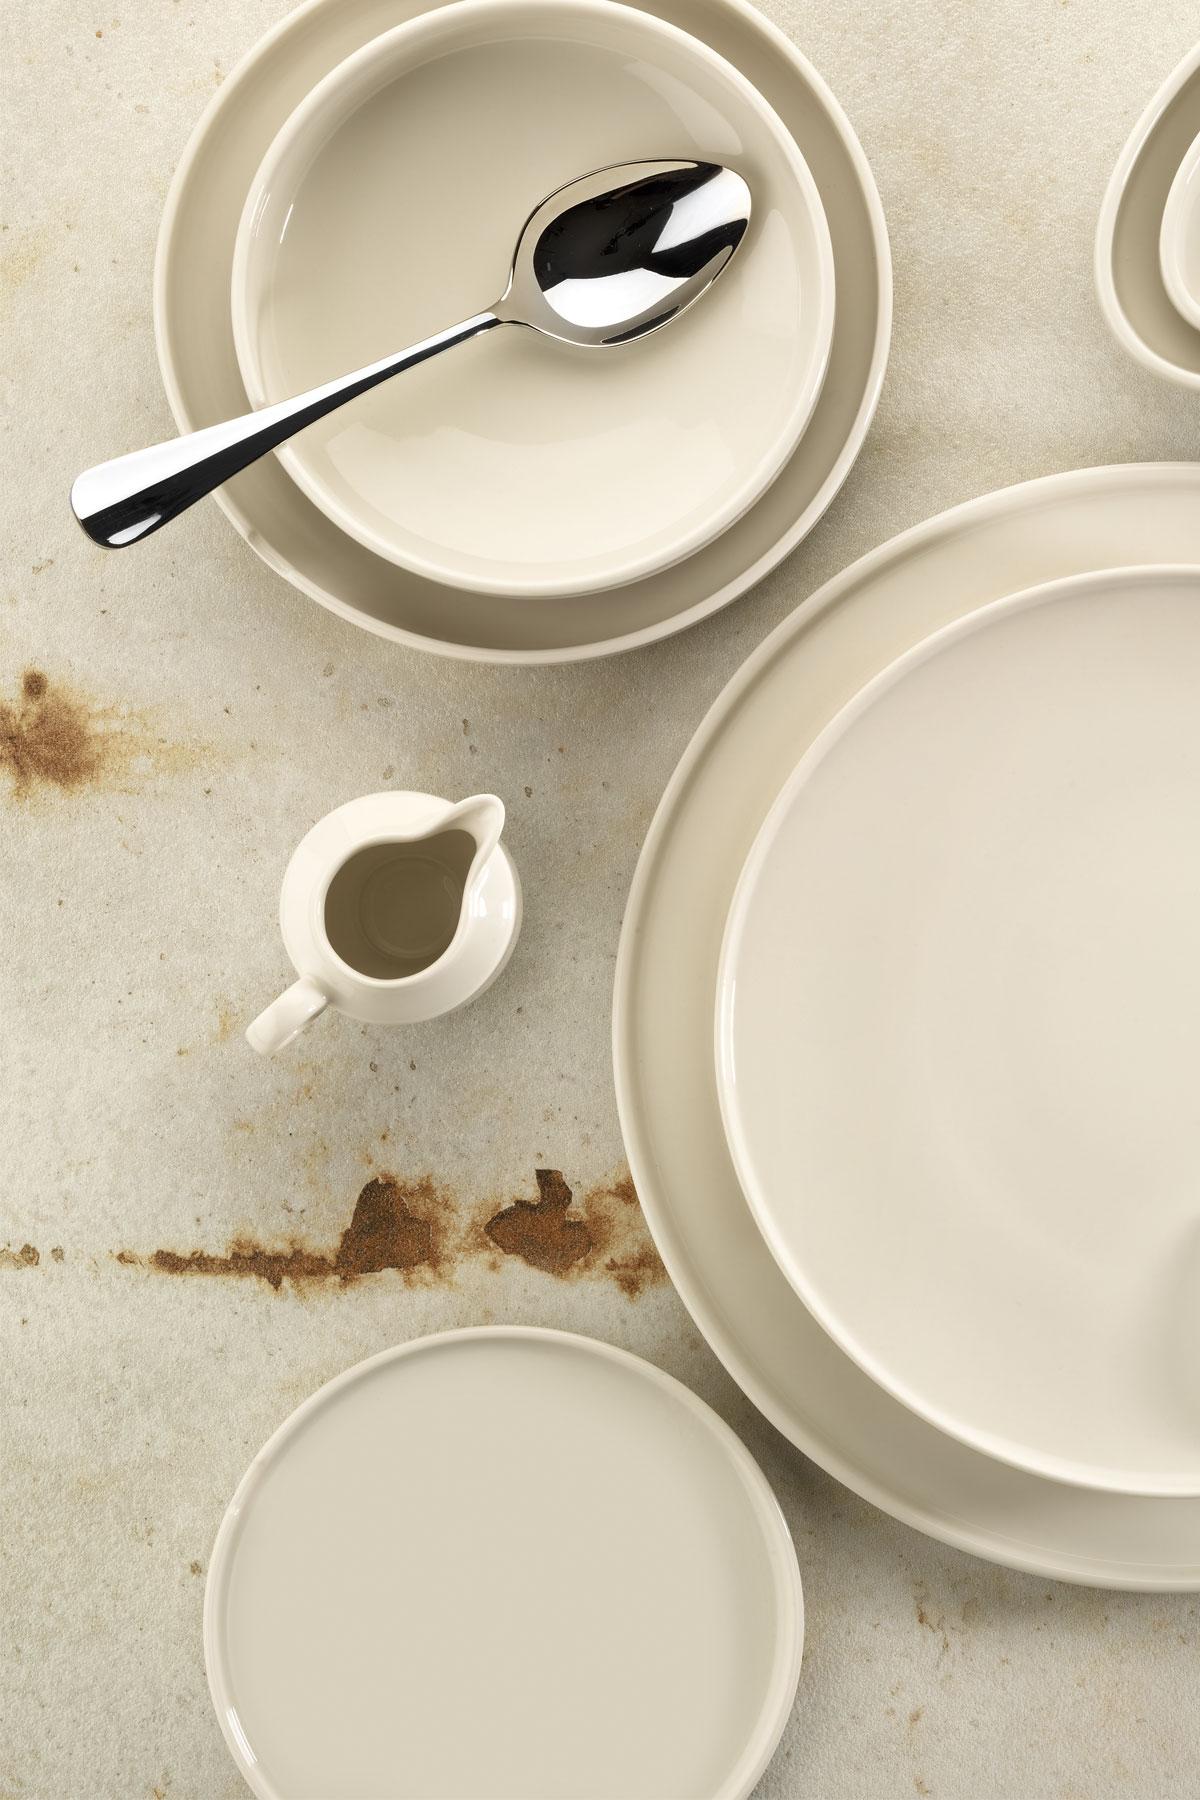 Kütahya Porselen Chef Taste Of 28 cm Düz Tabak Krem